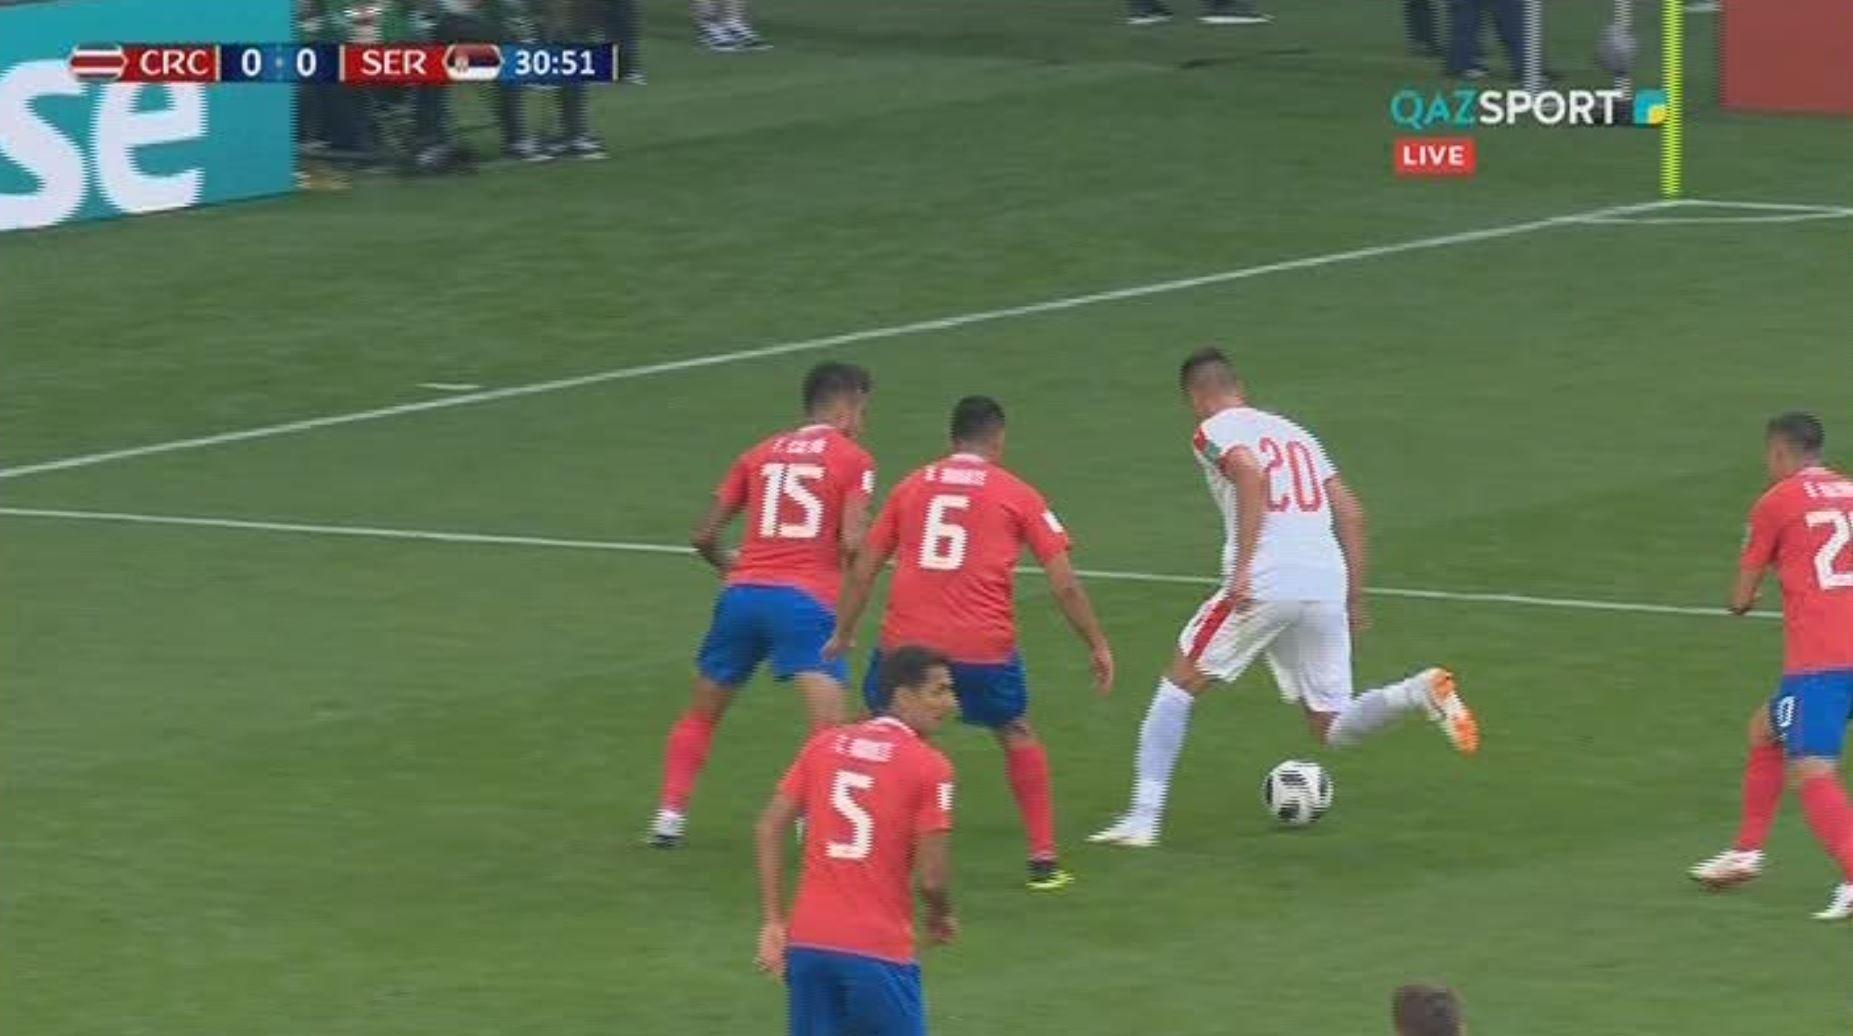 Гол Коларова принес победу Сербии над Коста-Рикой